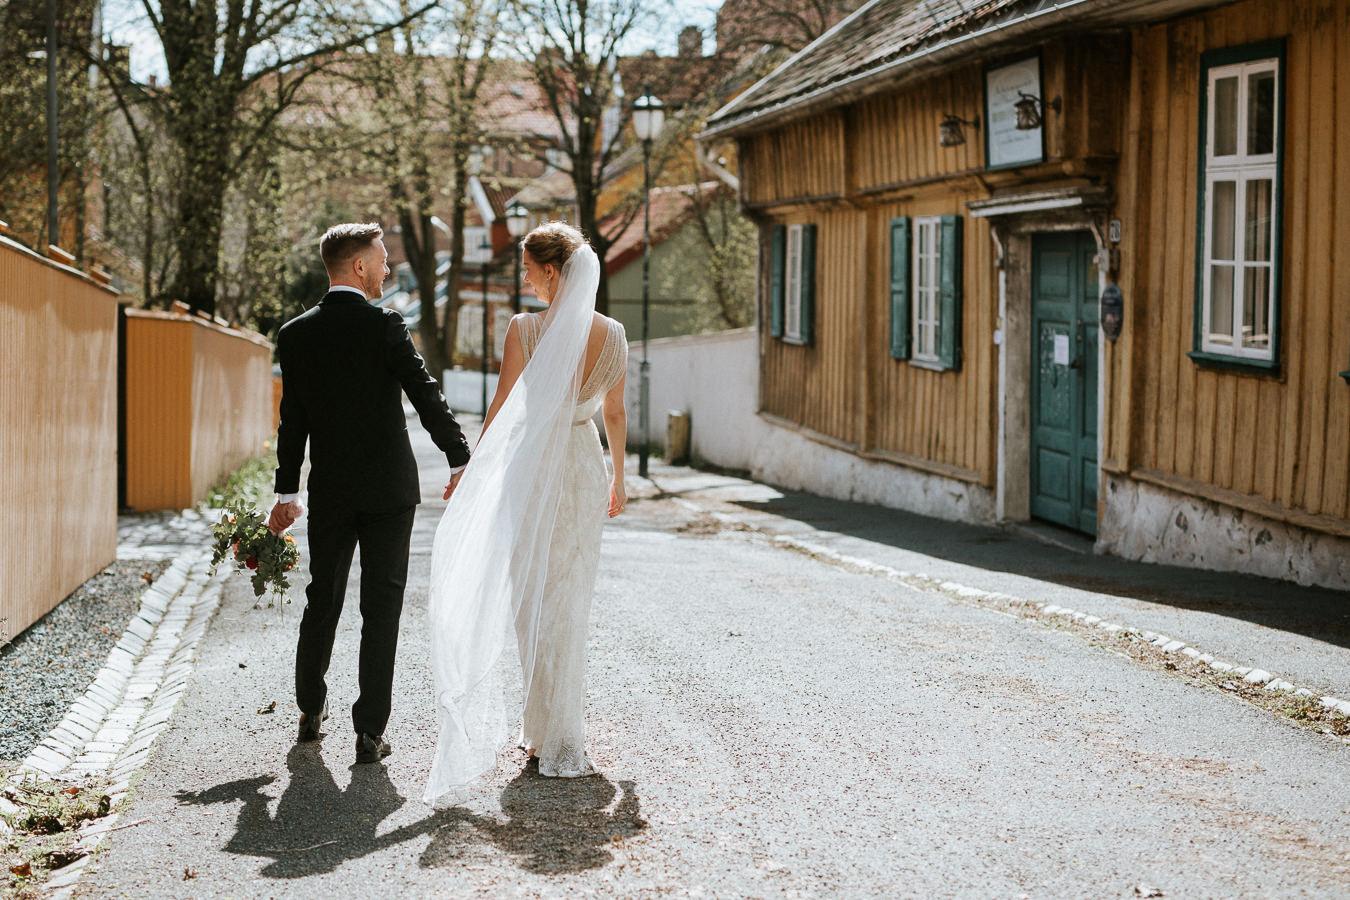 Tone-Tvedt-bryllup-fotograf-månefisken-112.jpg